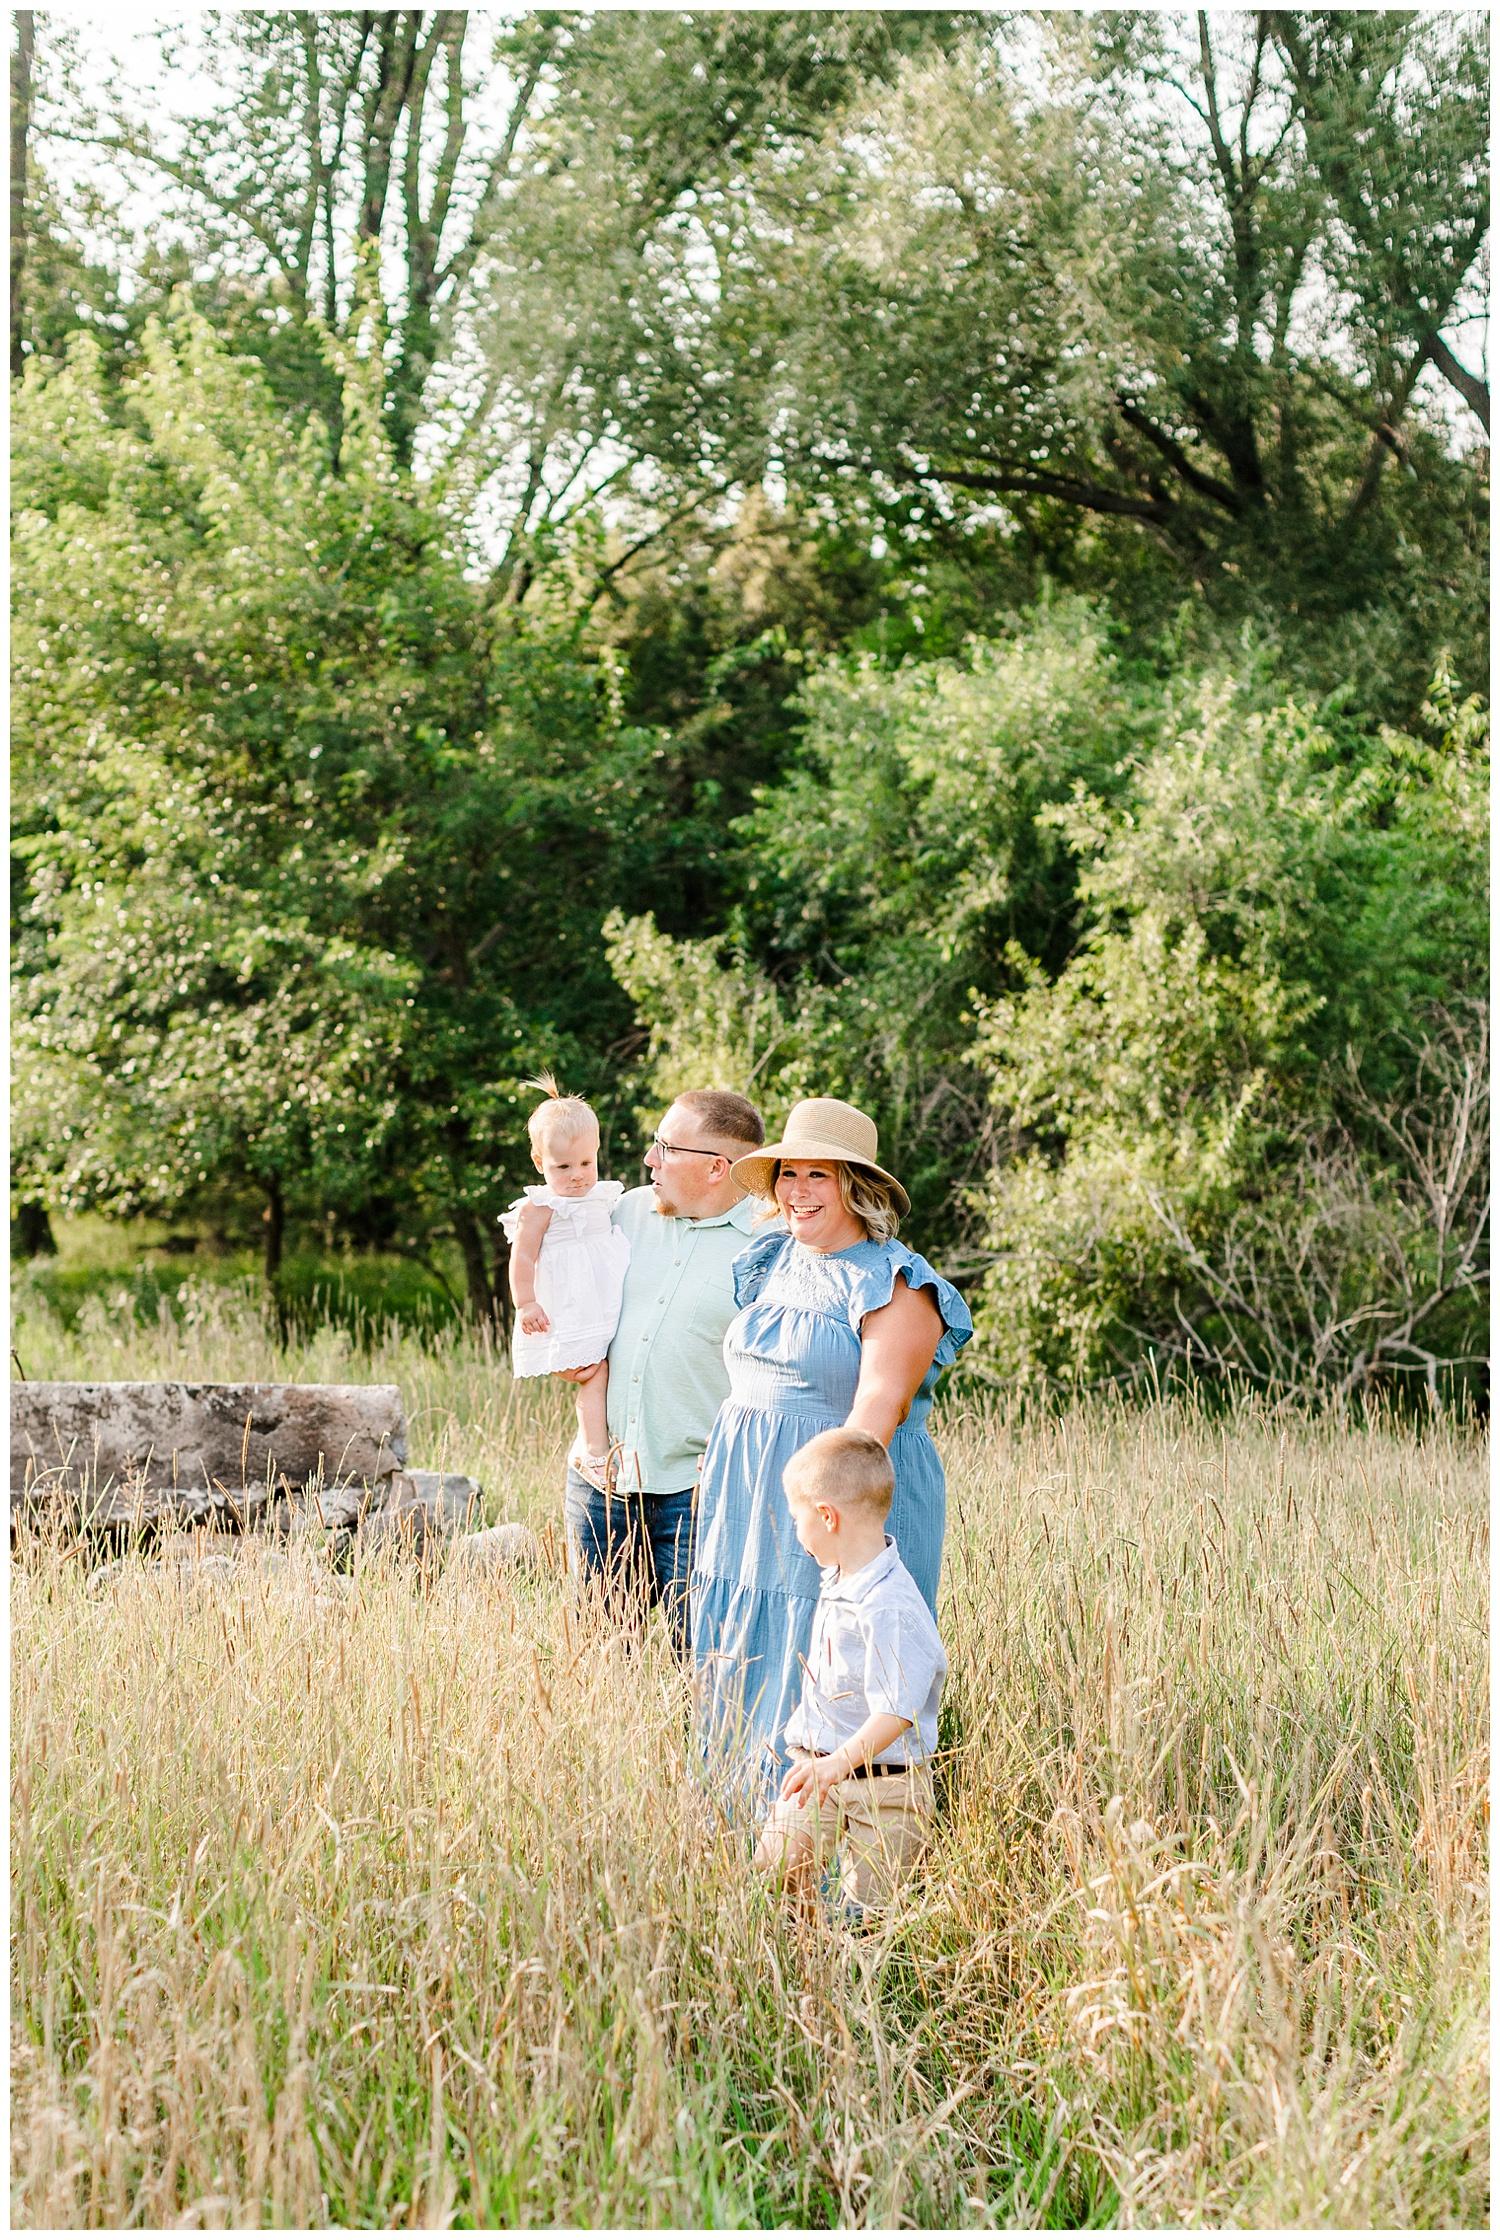 The Bruhn family walk together in a grassy pasture in Iowa | CB Studio